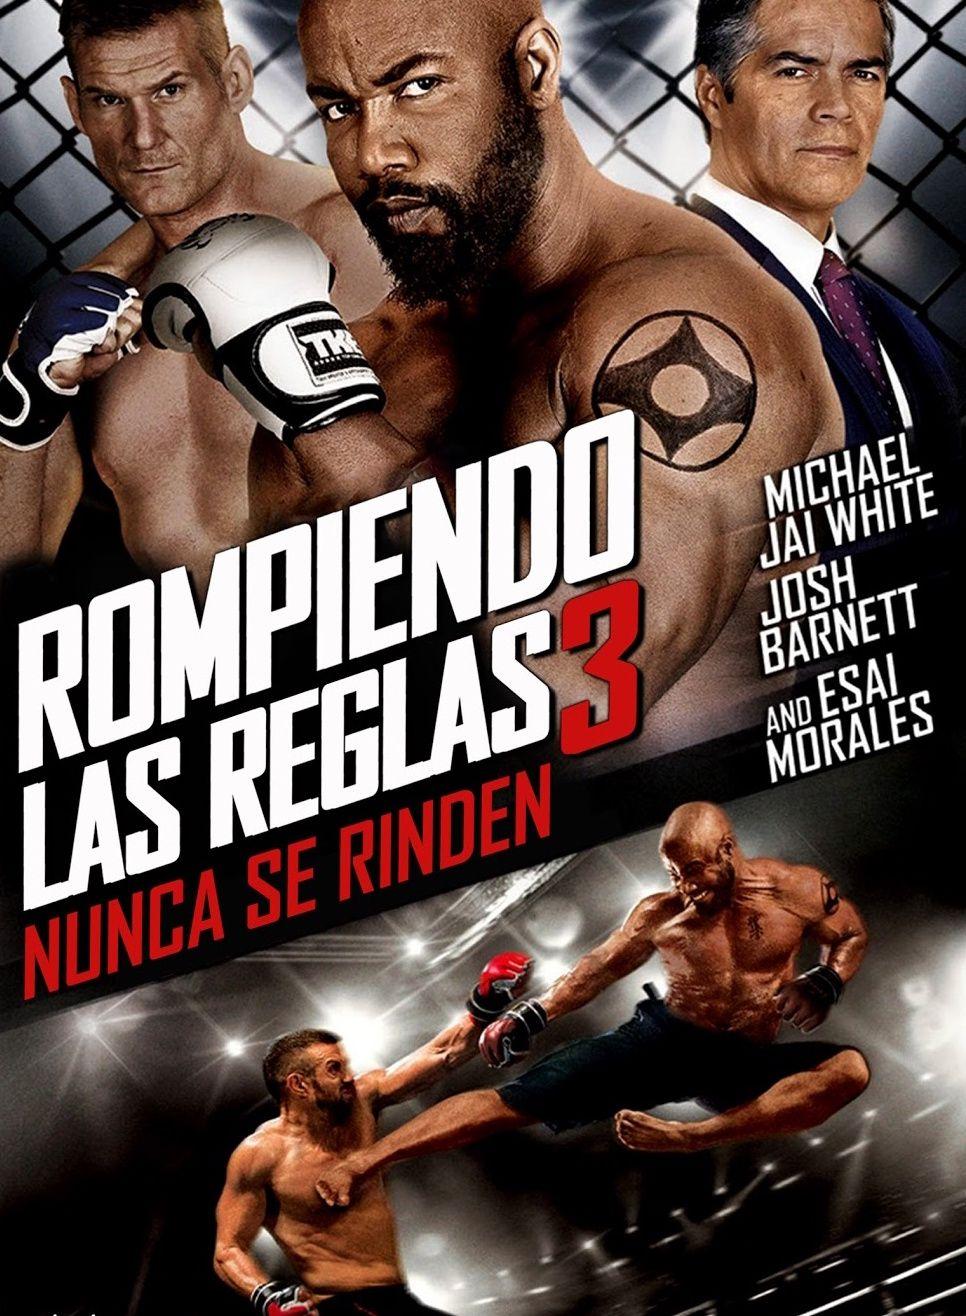 Rompiendo Las Reglas Full Movies Online Free Free Movies Online Never Back Down